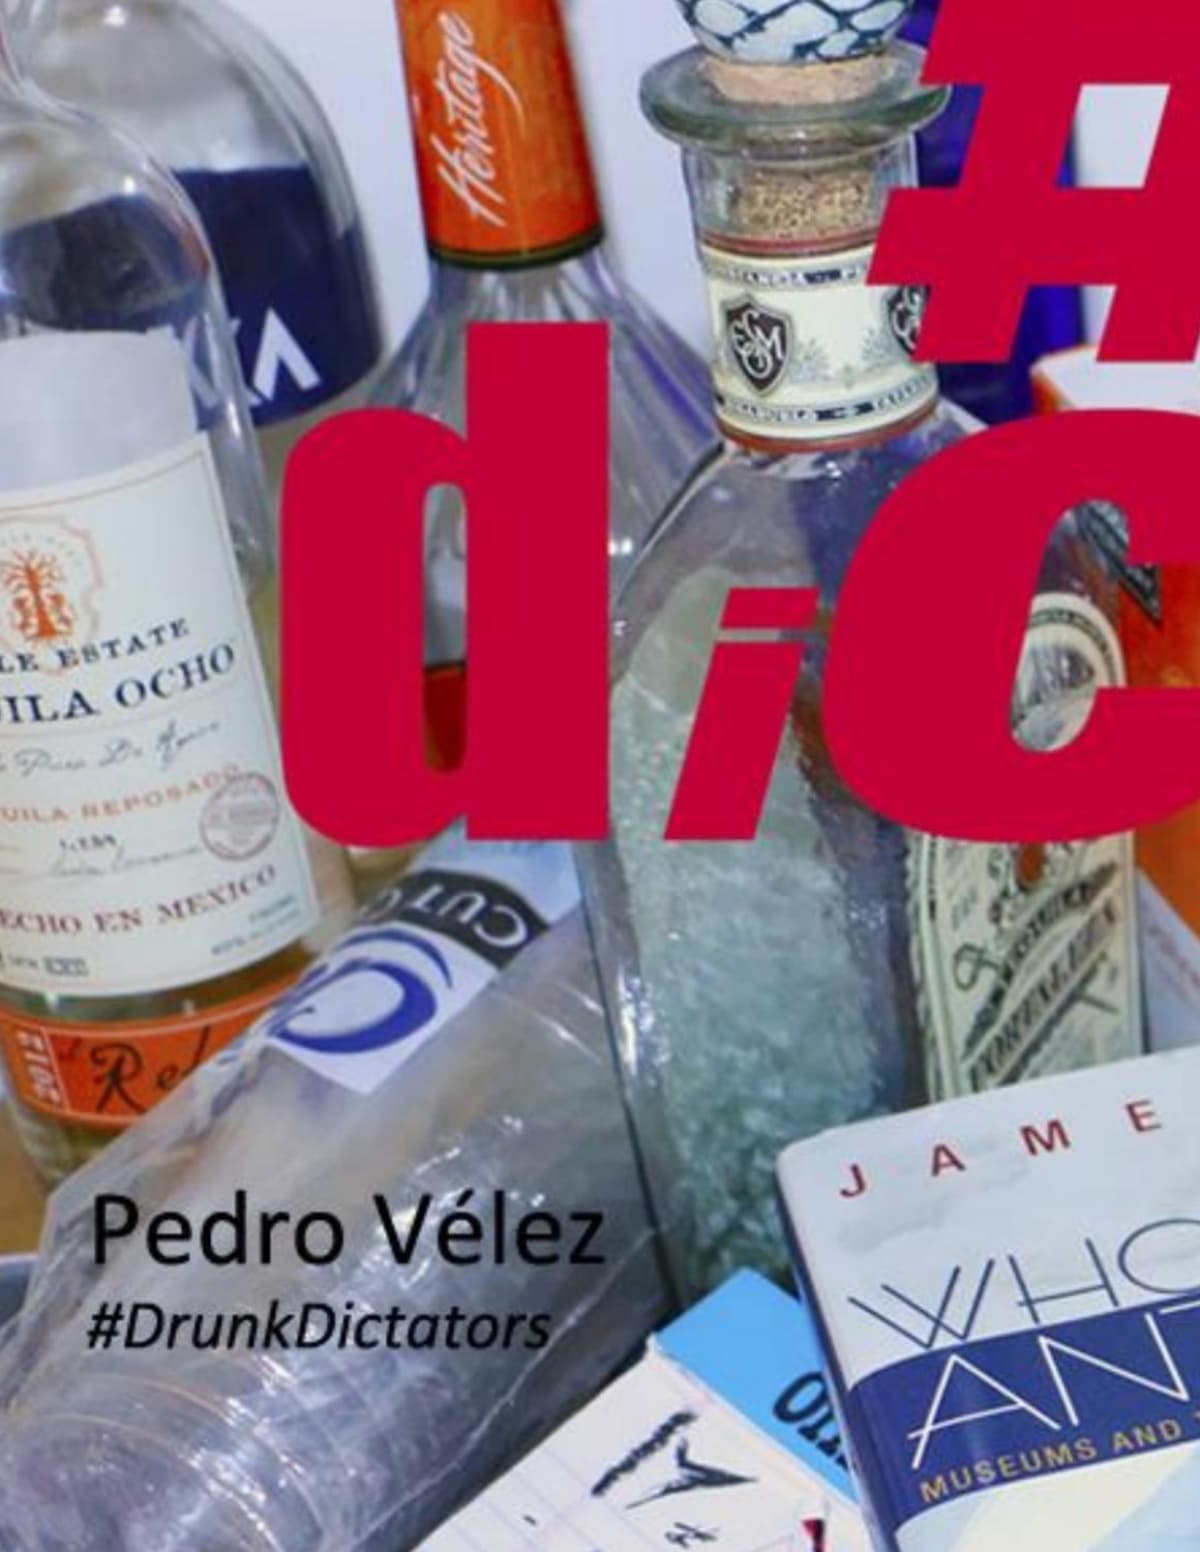 Pedro Vélez: #DrunkDictators